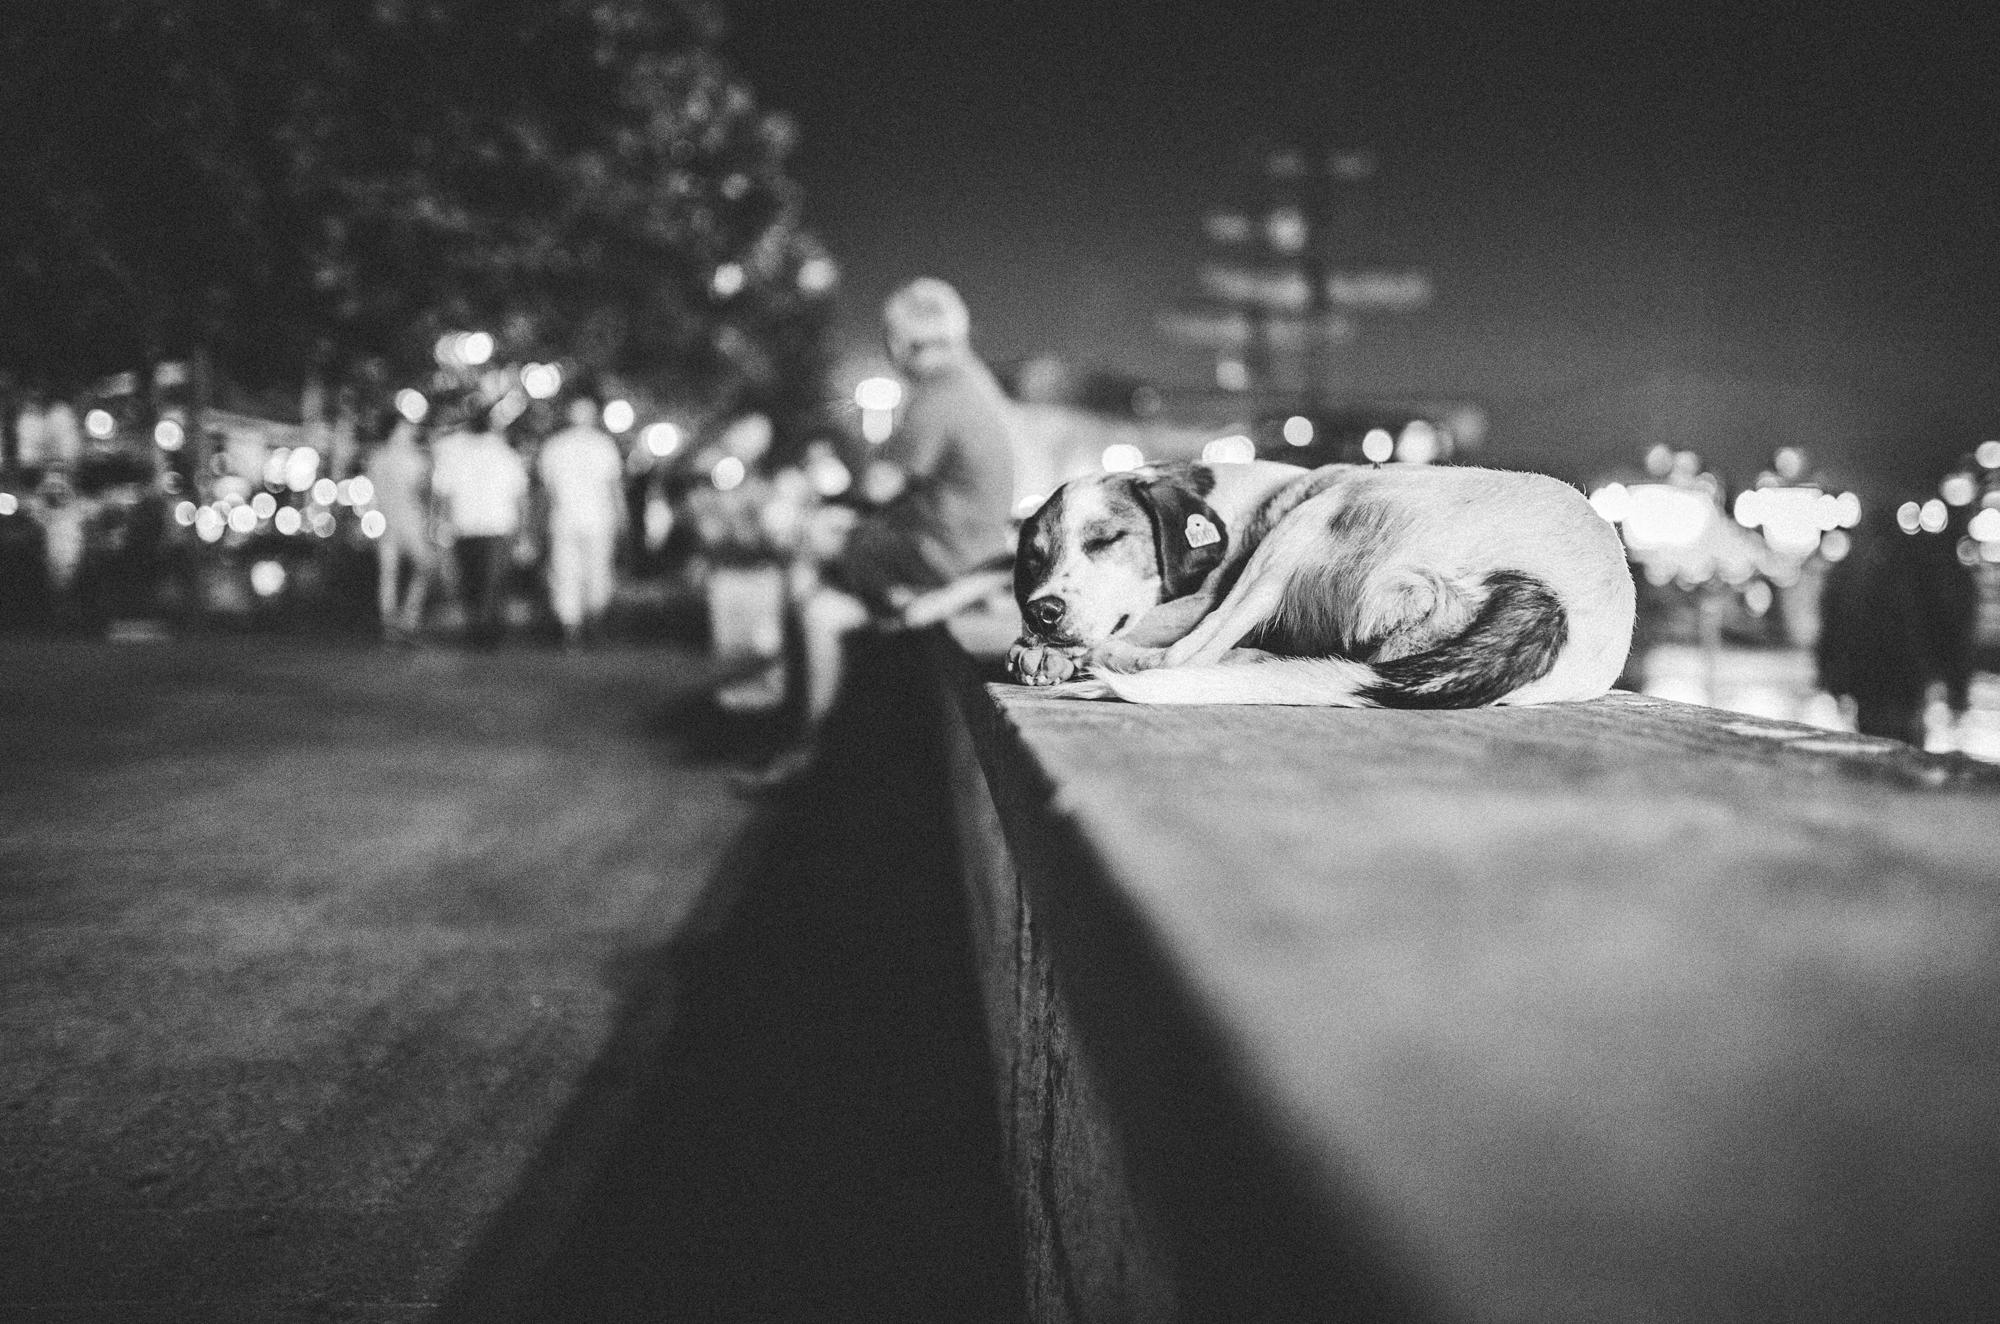 A street dog lying on a bench in Skopje, Macedonia.